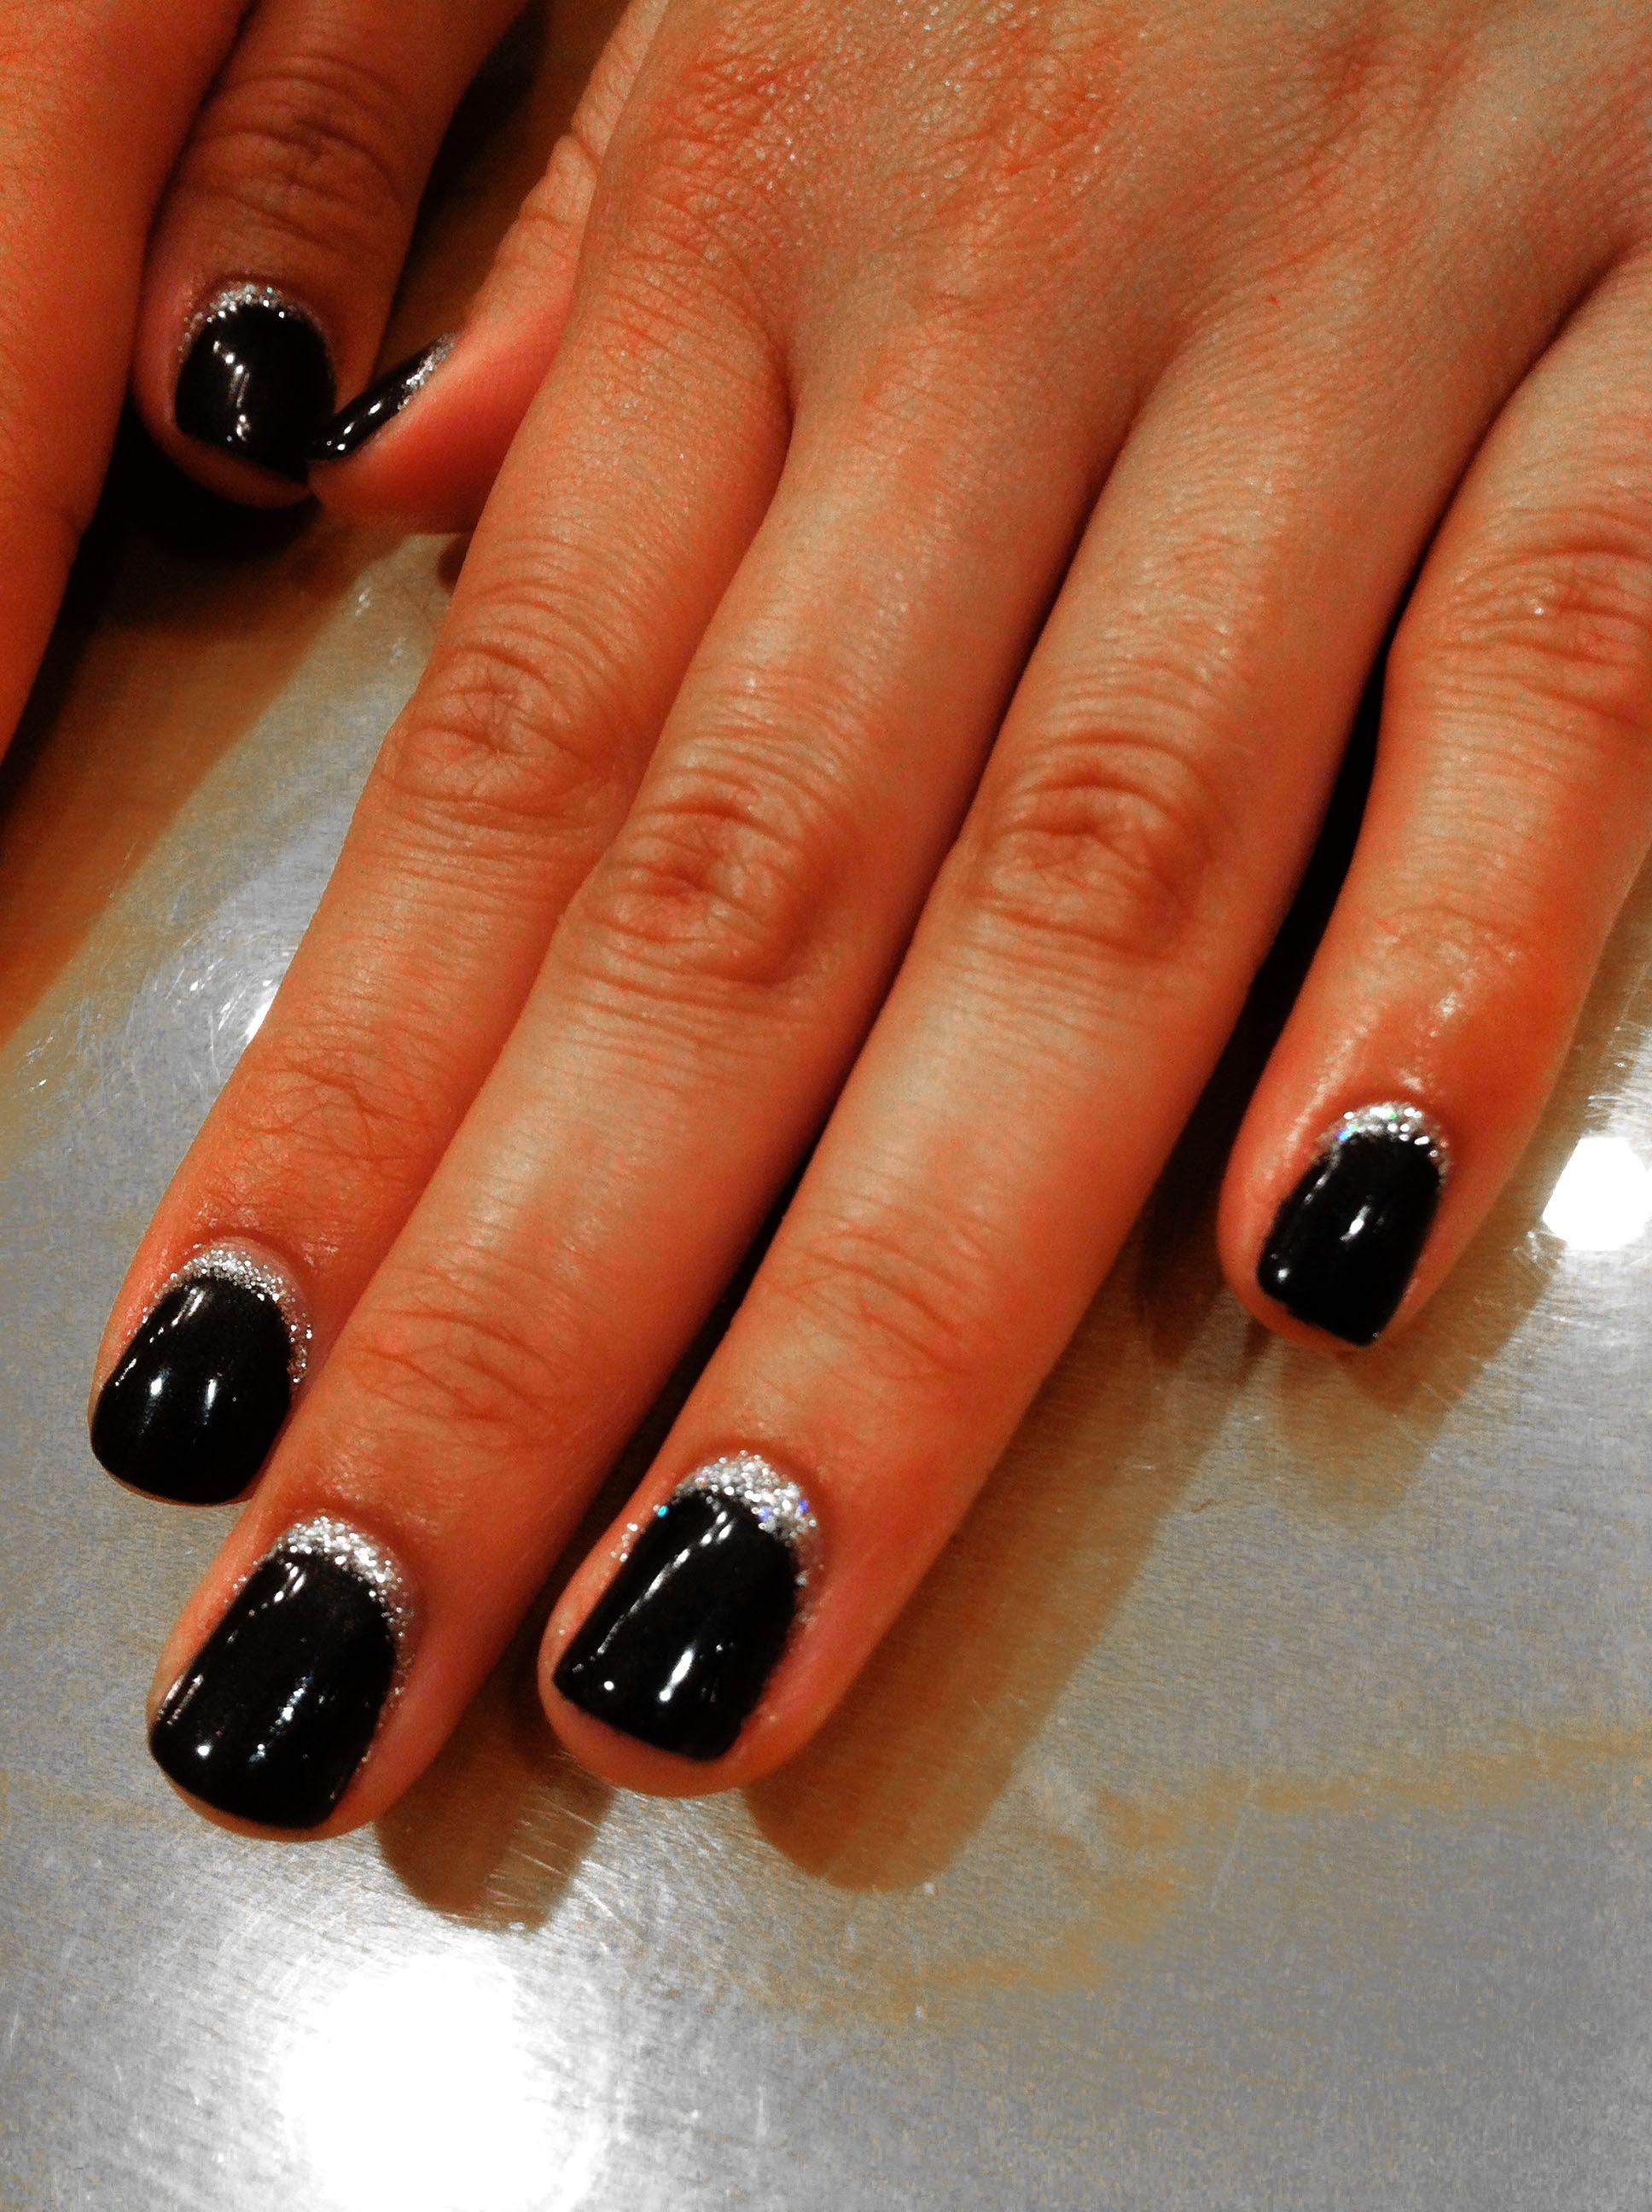 Black Onyx Shellec polish with Gellish glitter along the cuticles ...